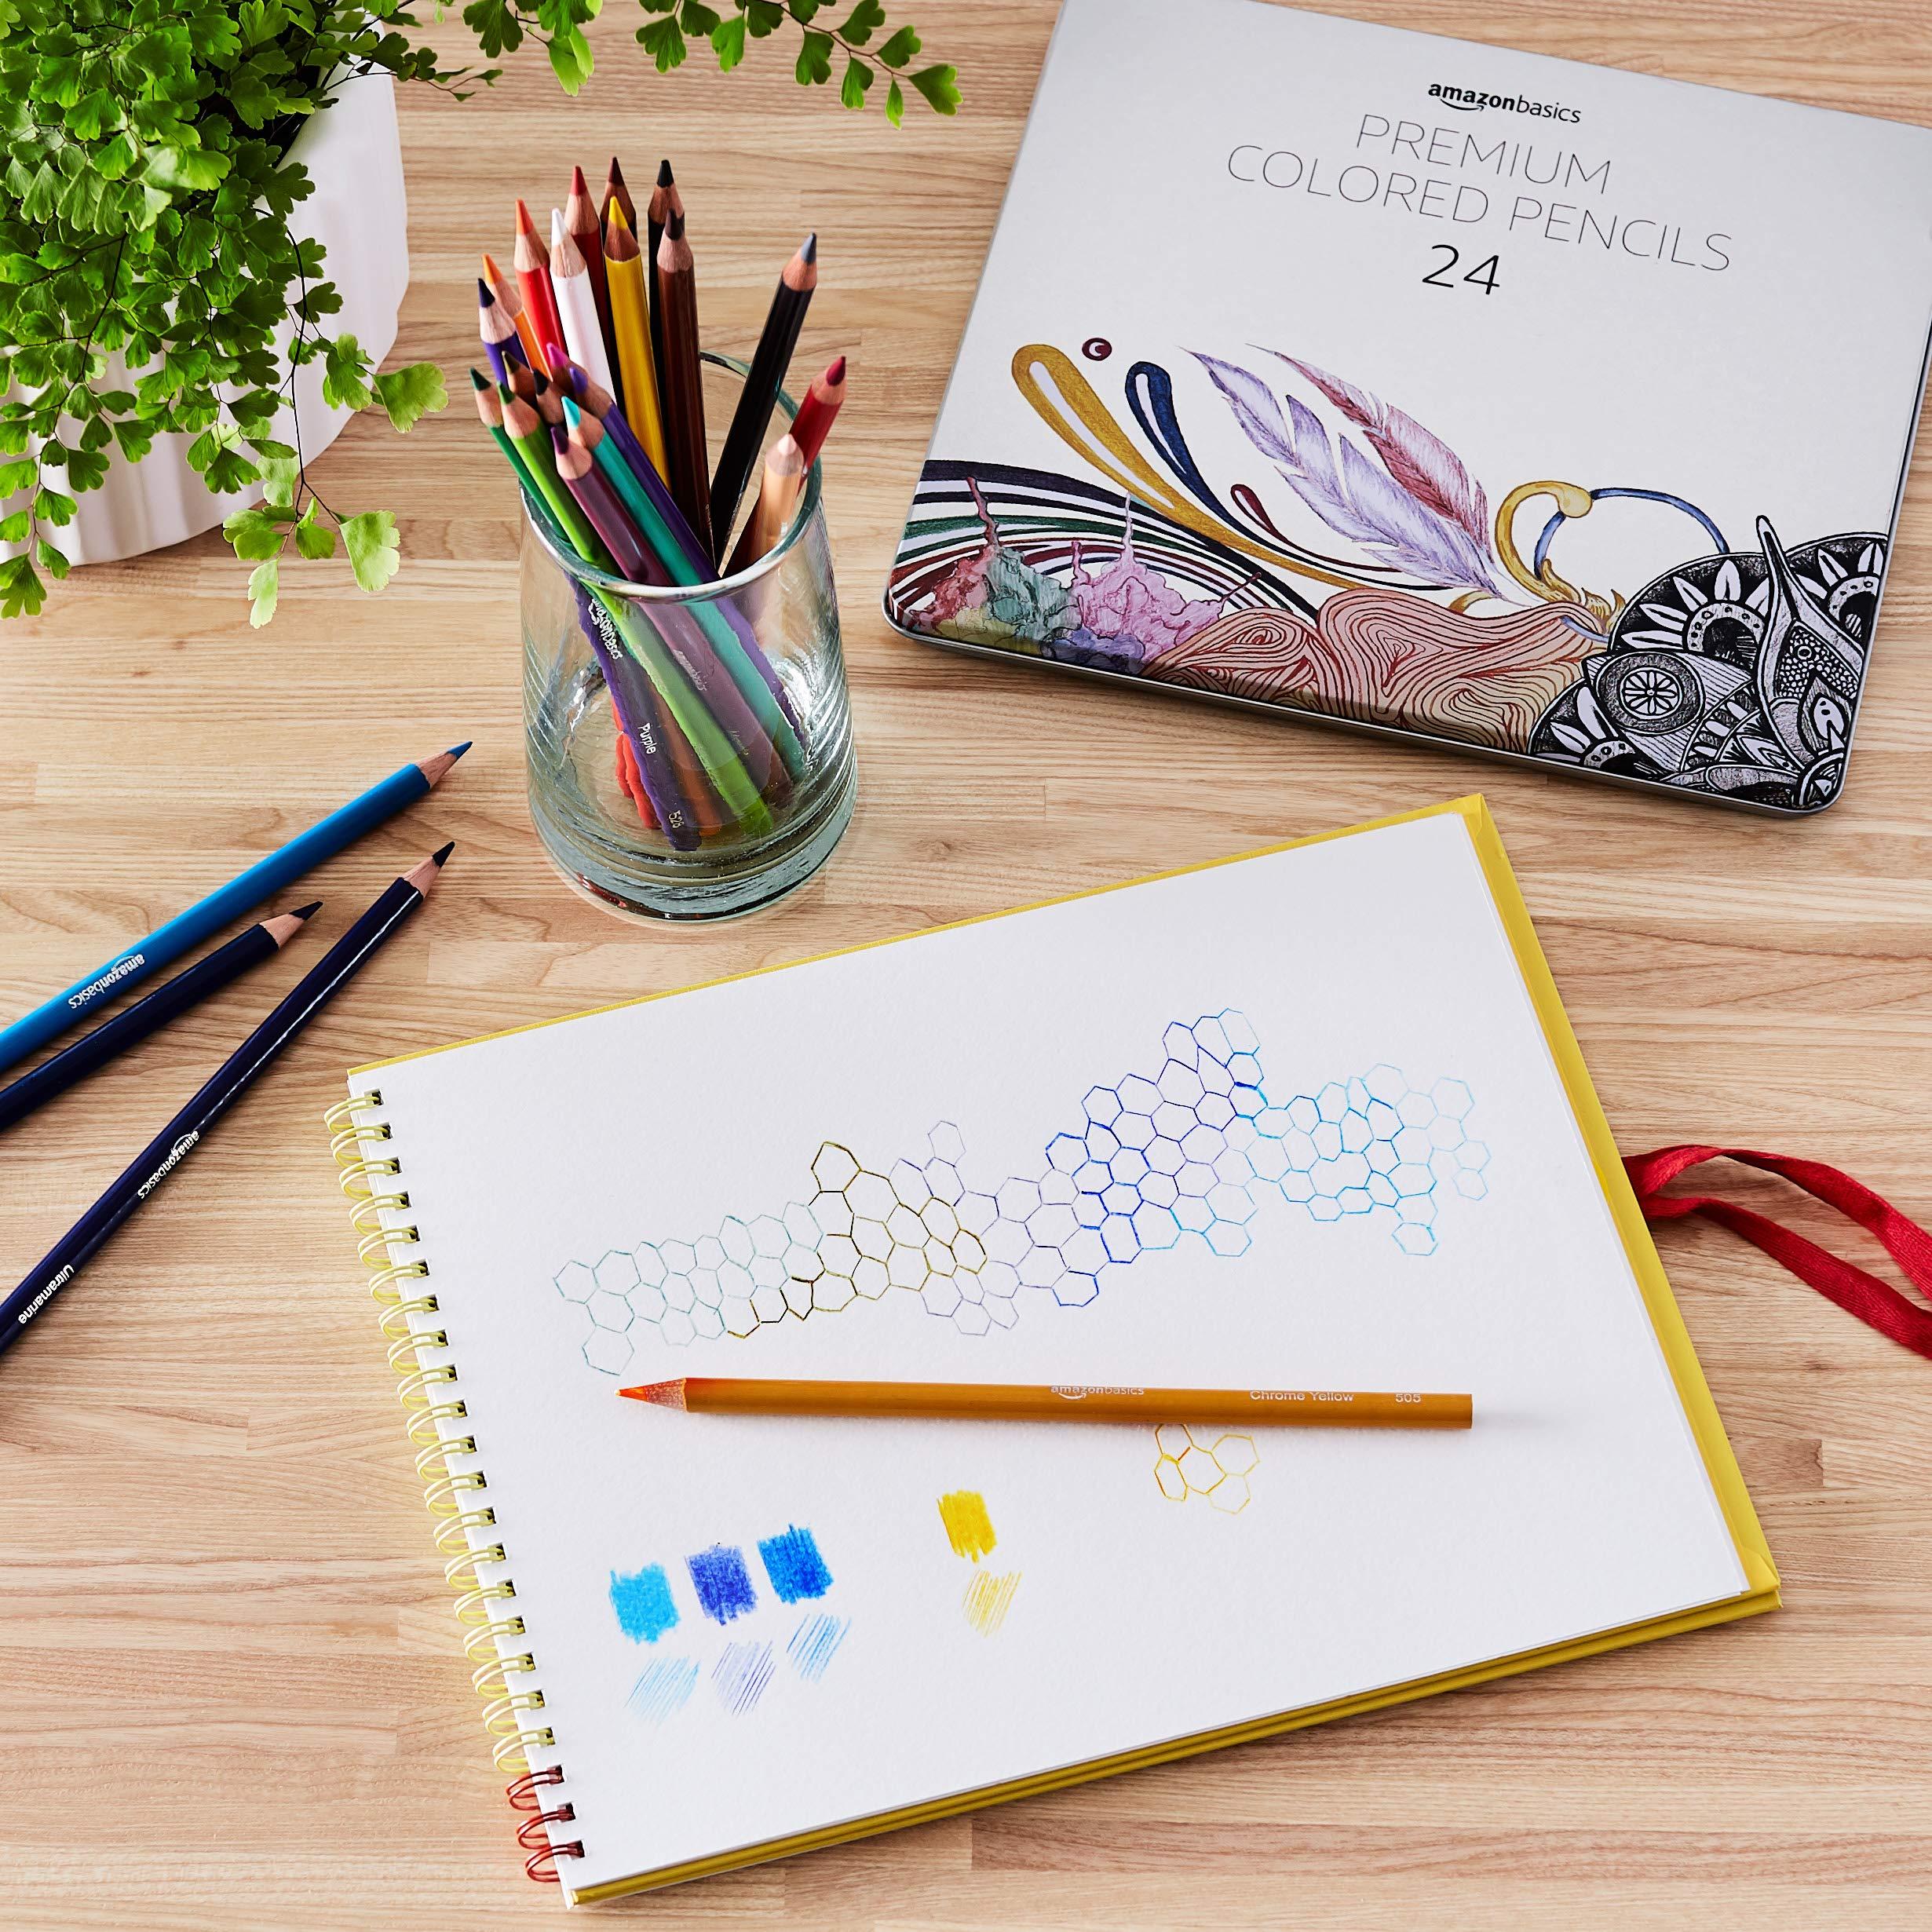 AmazonBasics Colored Pencils - 24-Count by AmazonBasics (Image #2)